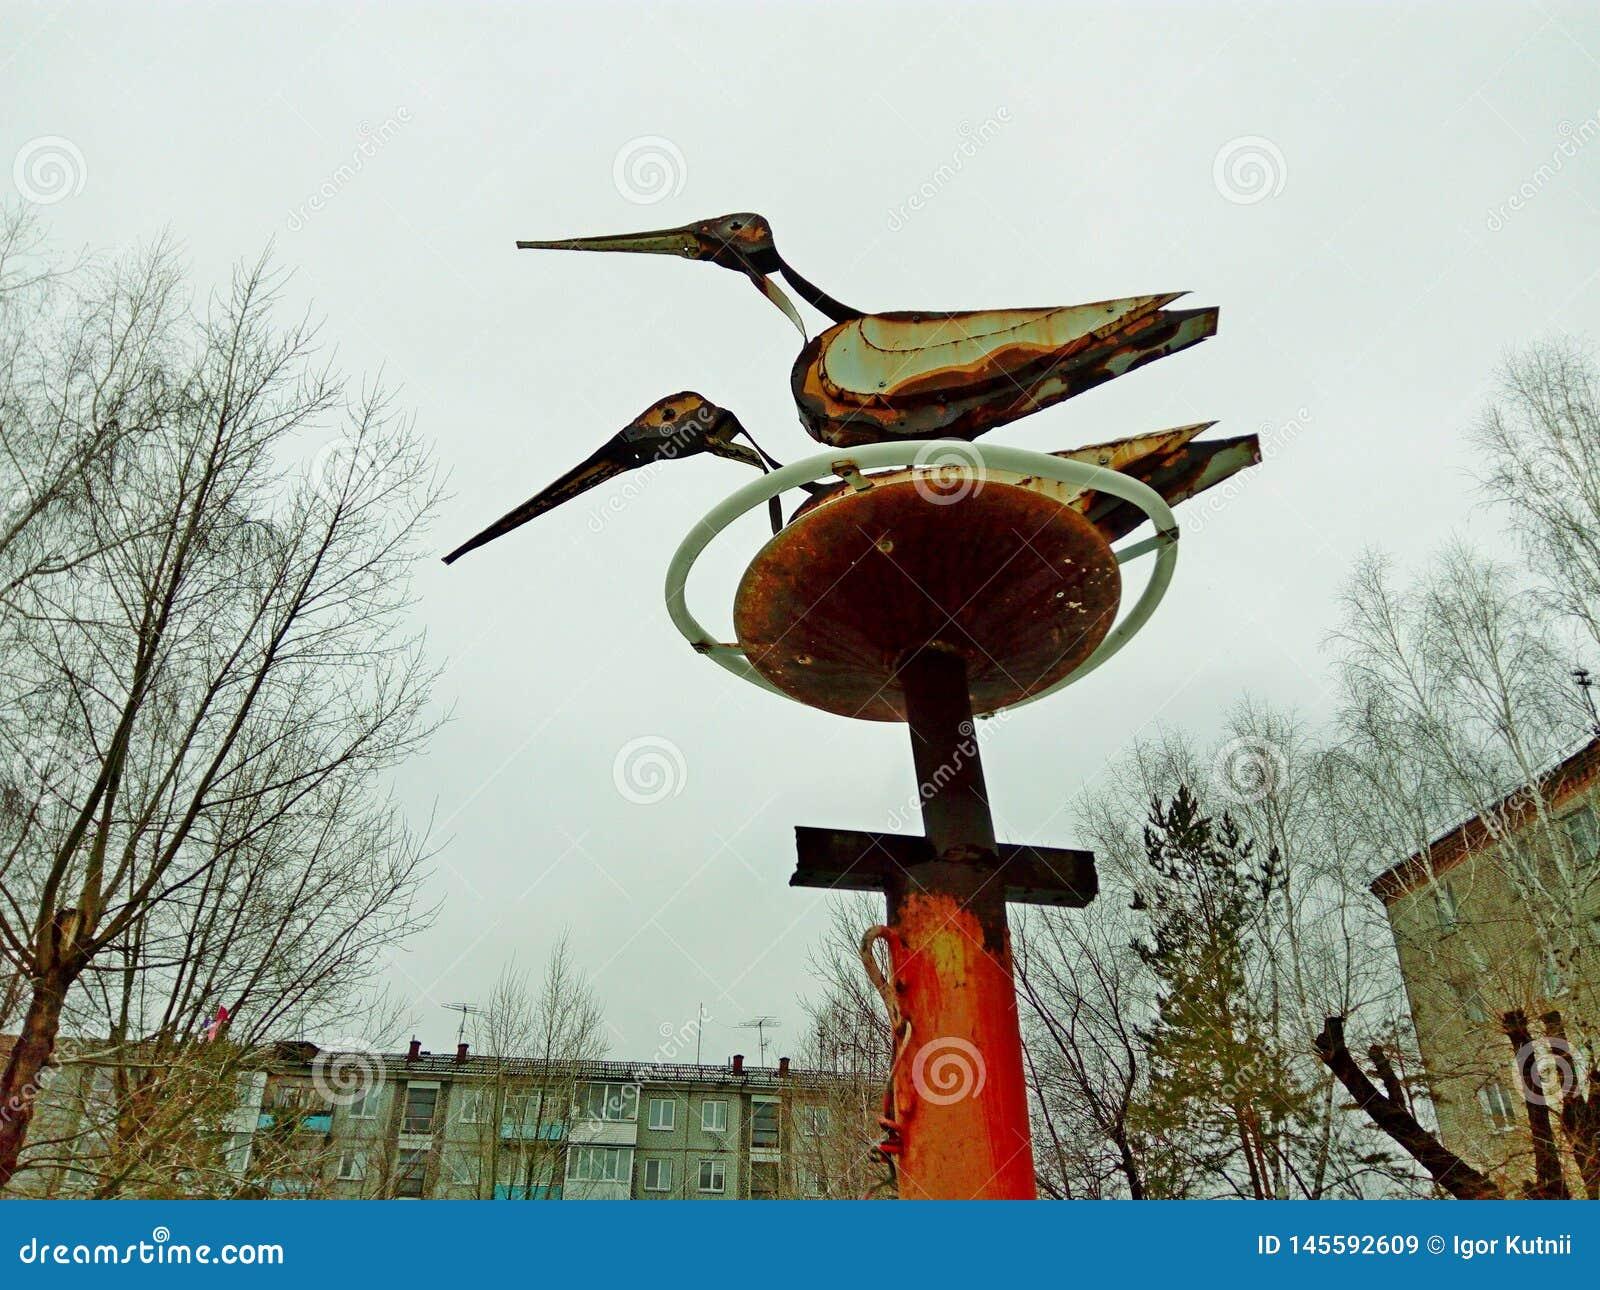 Storks in the nest.